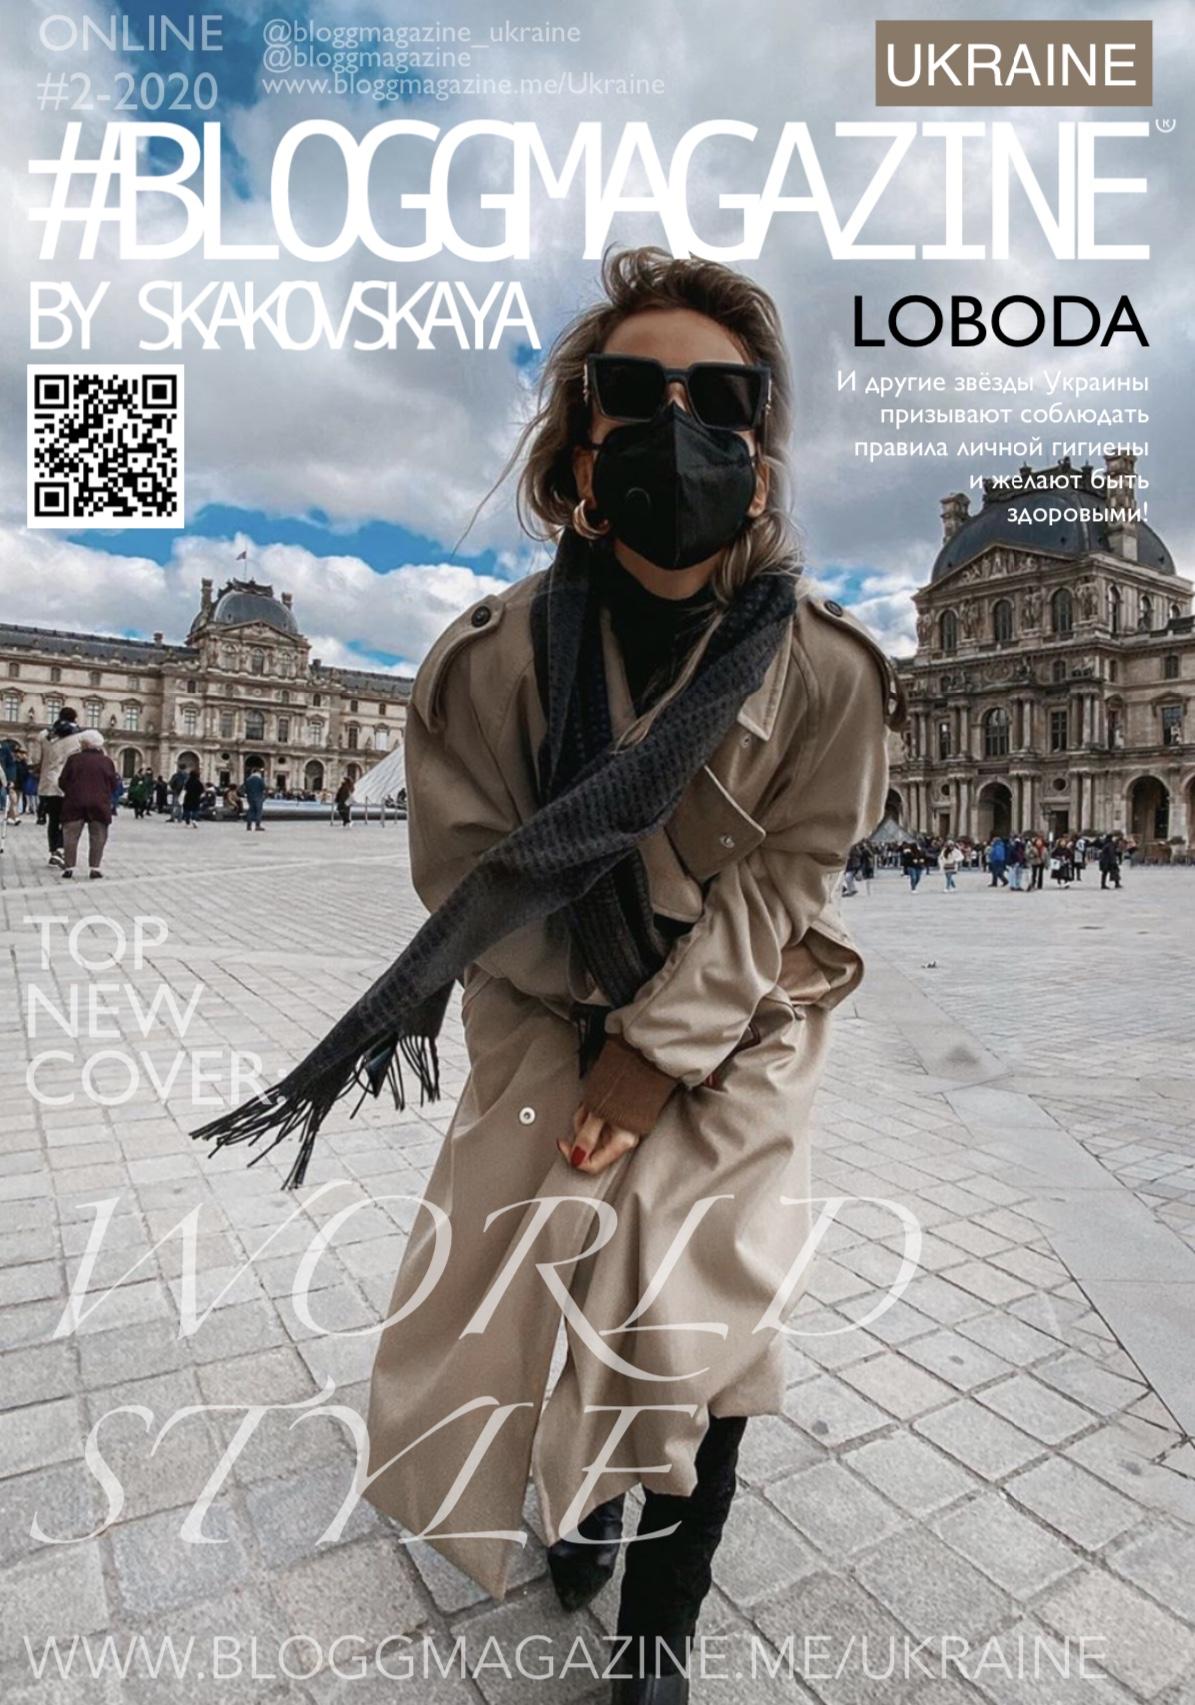 bloggmagazine_ukraine_online_loboda_2020